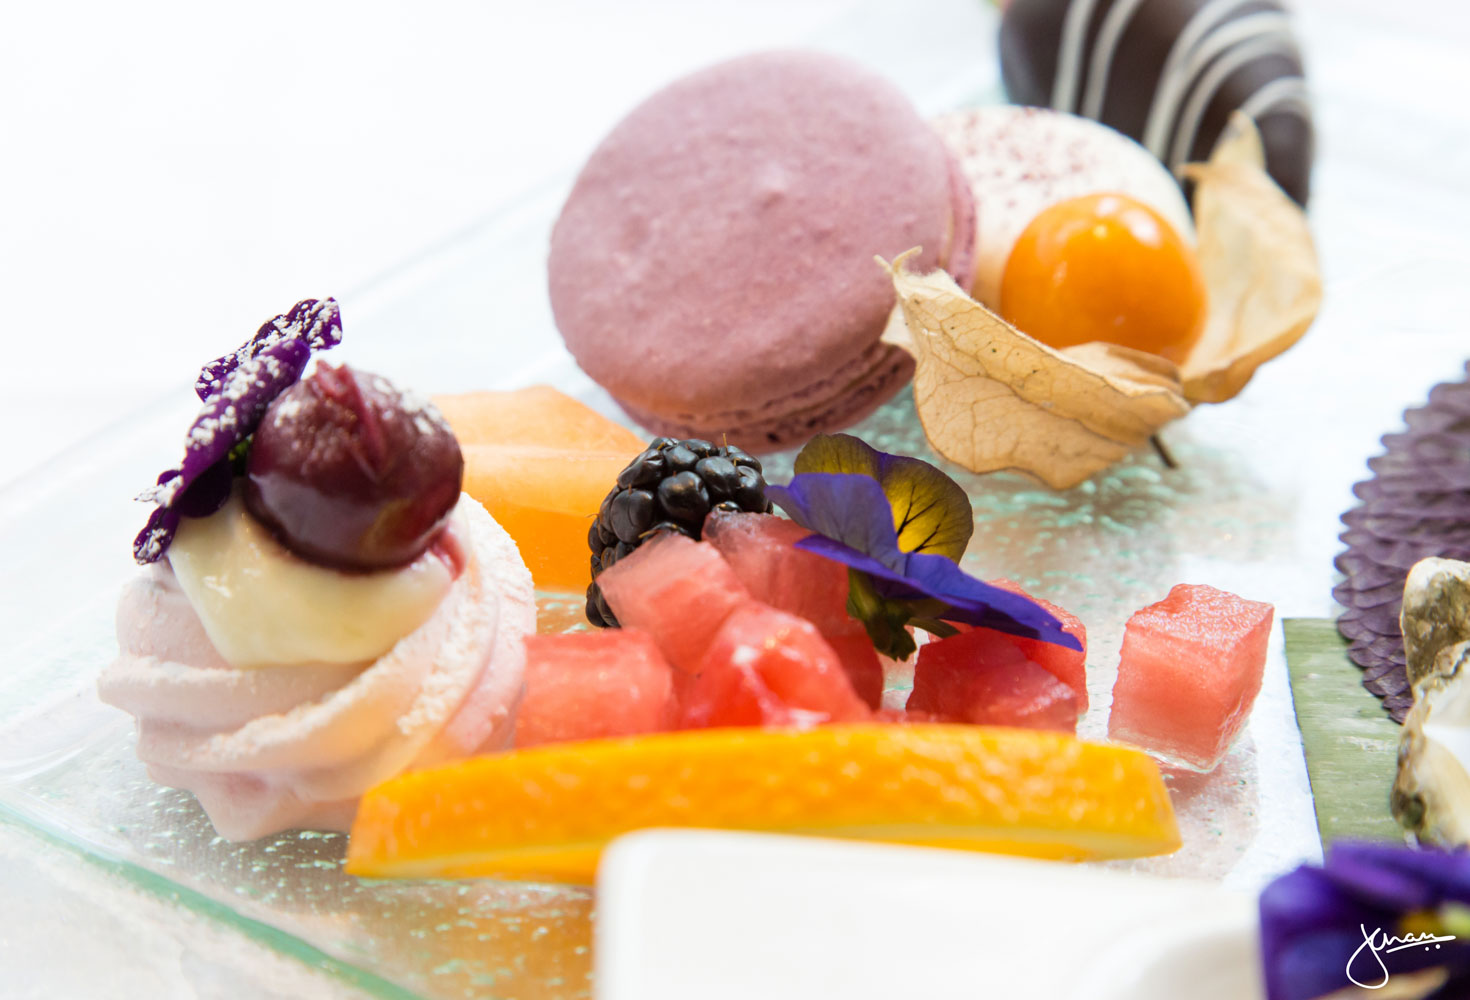 """ Sakura! Sakura! Tea "" Pavlova,TWG Tea Macaron,"" Tokyo-Singapore Tea "" Cheesecake,White and Dark Chocolate Dipped Strawberry &Mélange of Fresh Fruit"